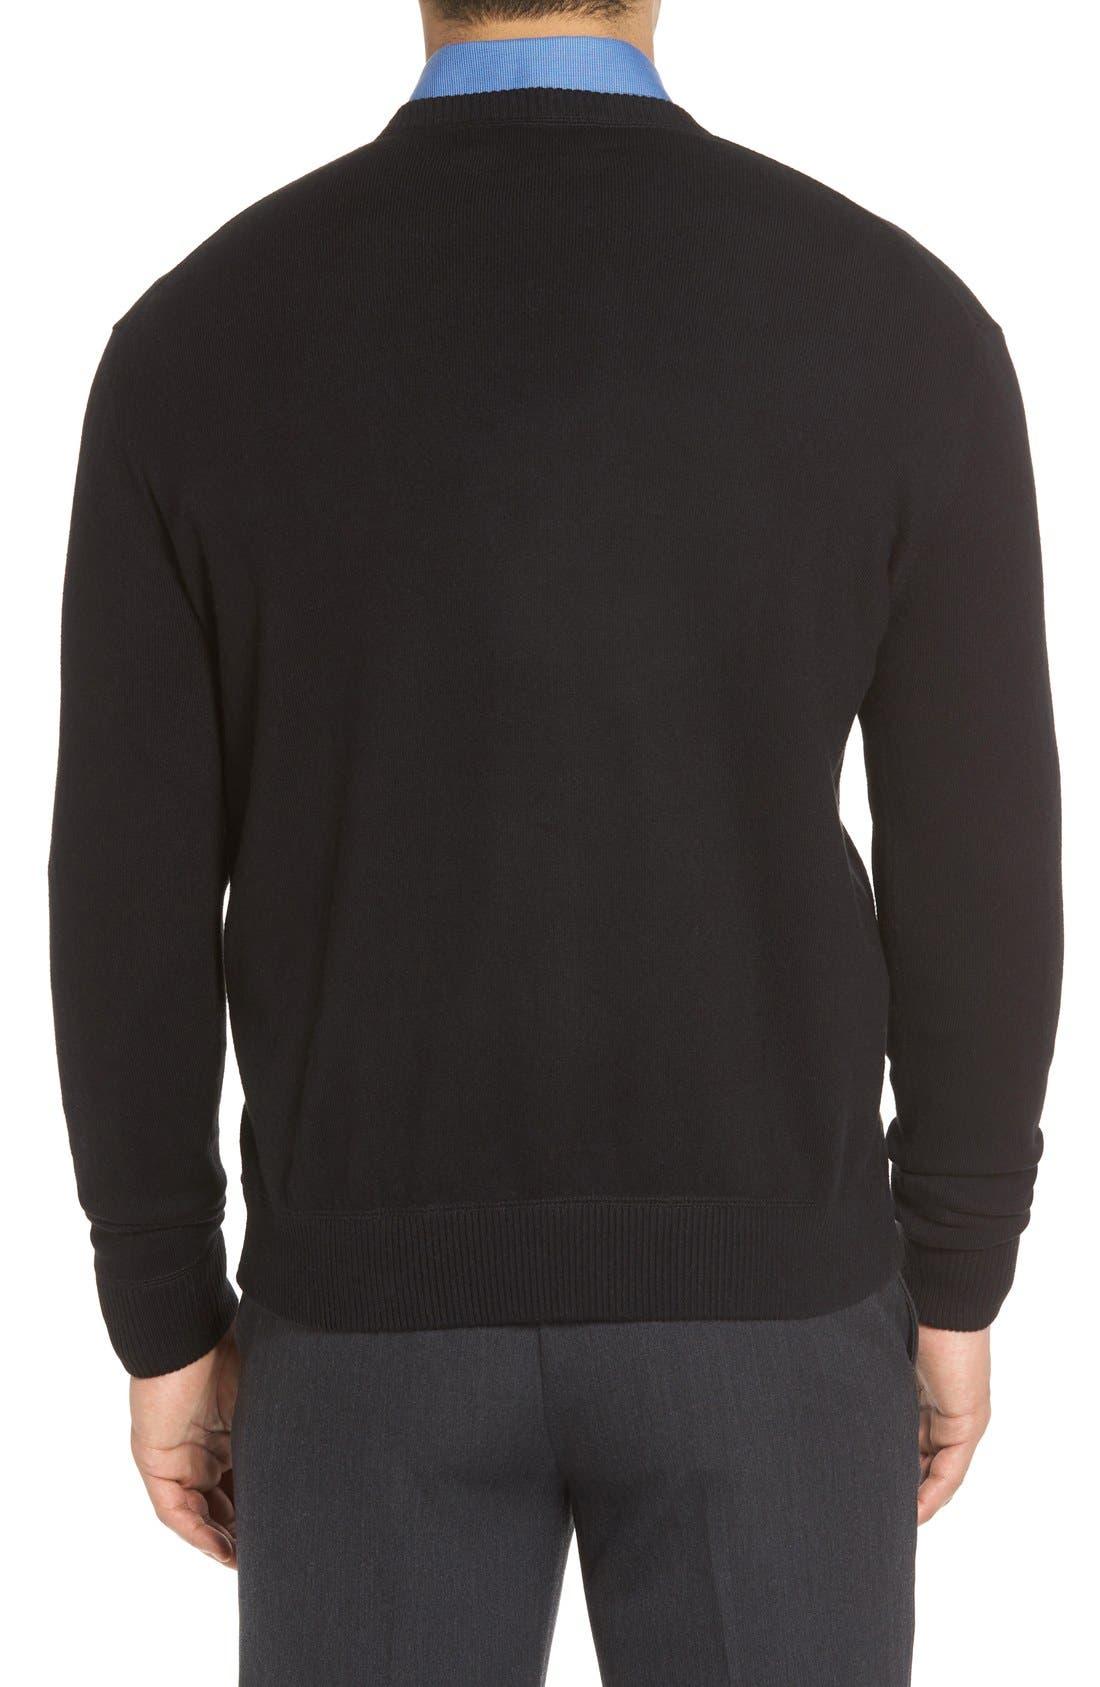 Alternate Image 2  - Robert Talbott 'Jersey Sport' Cotton Blend Crewneck Sweater